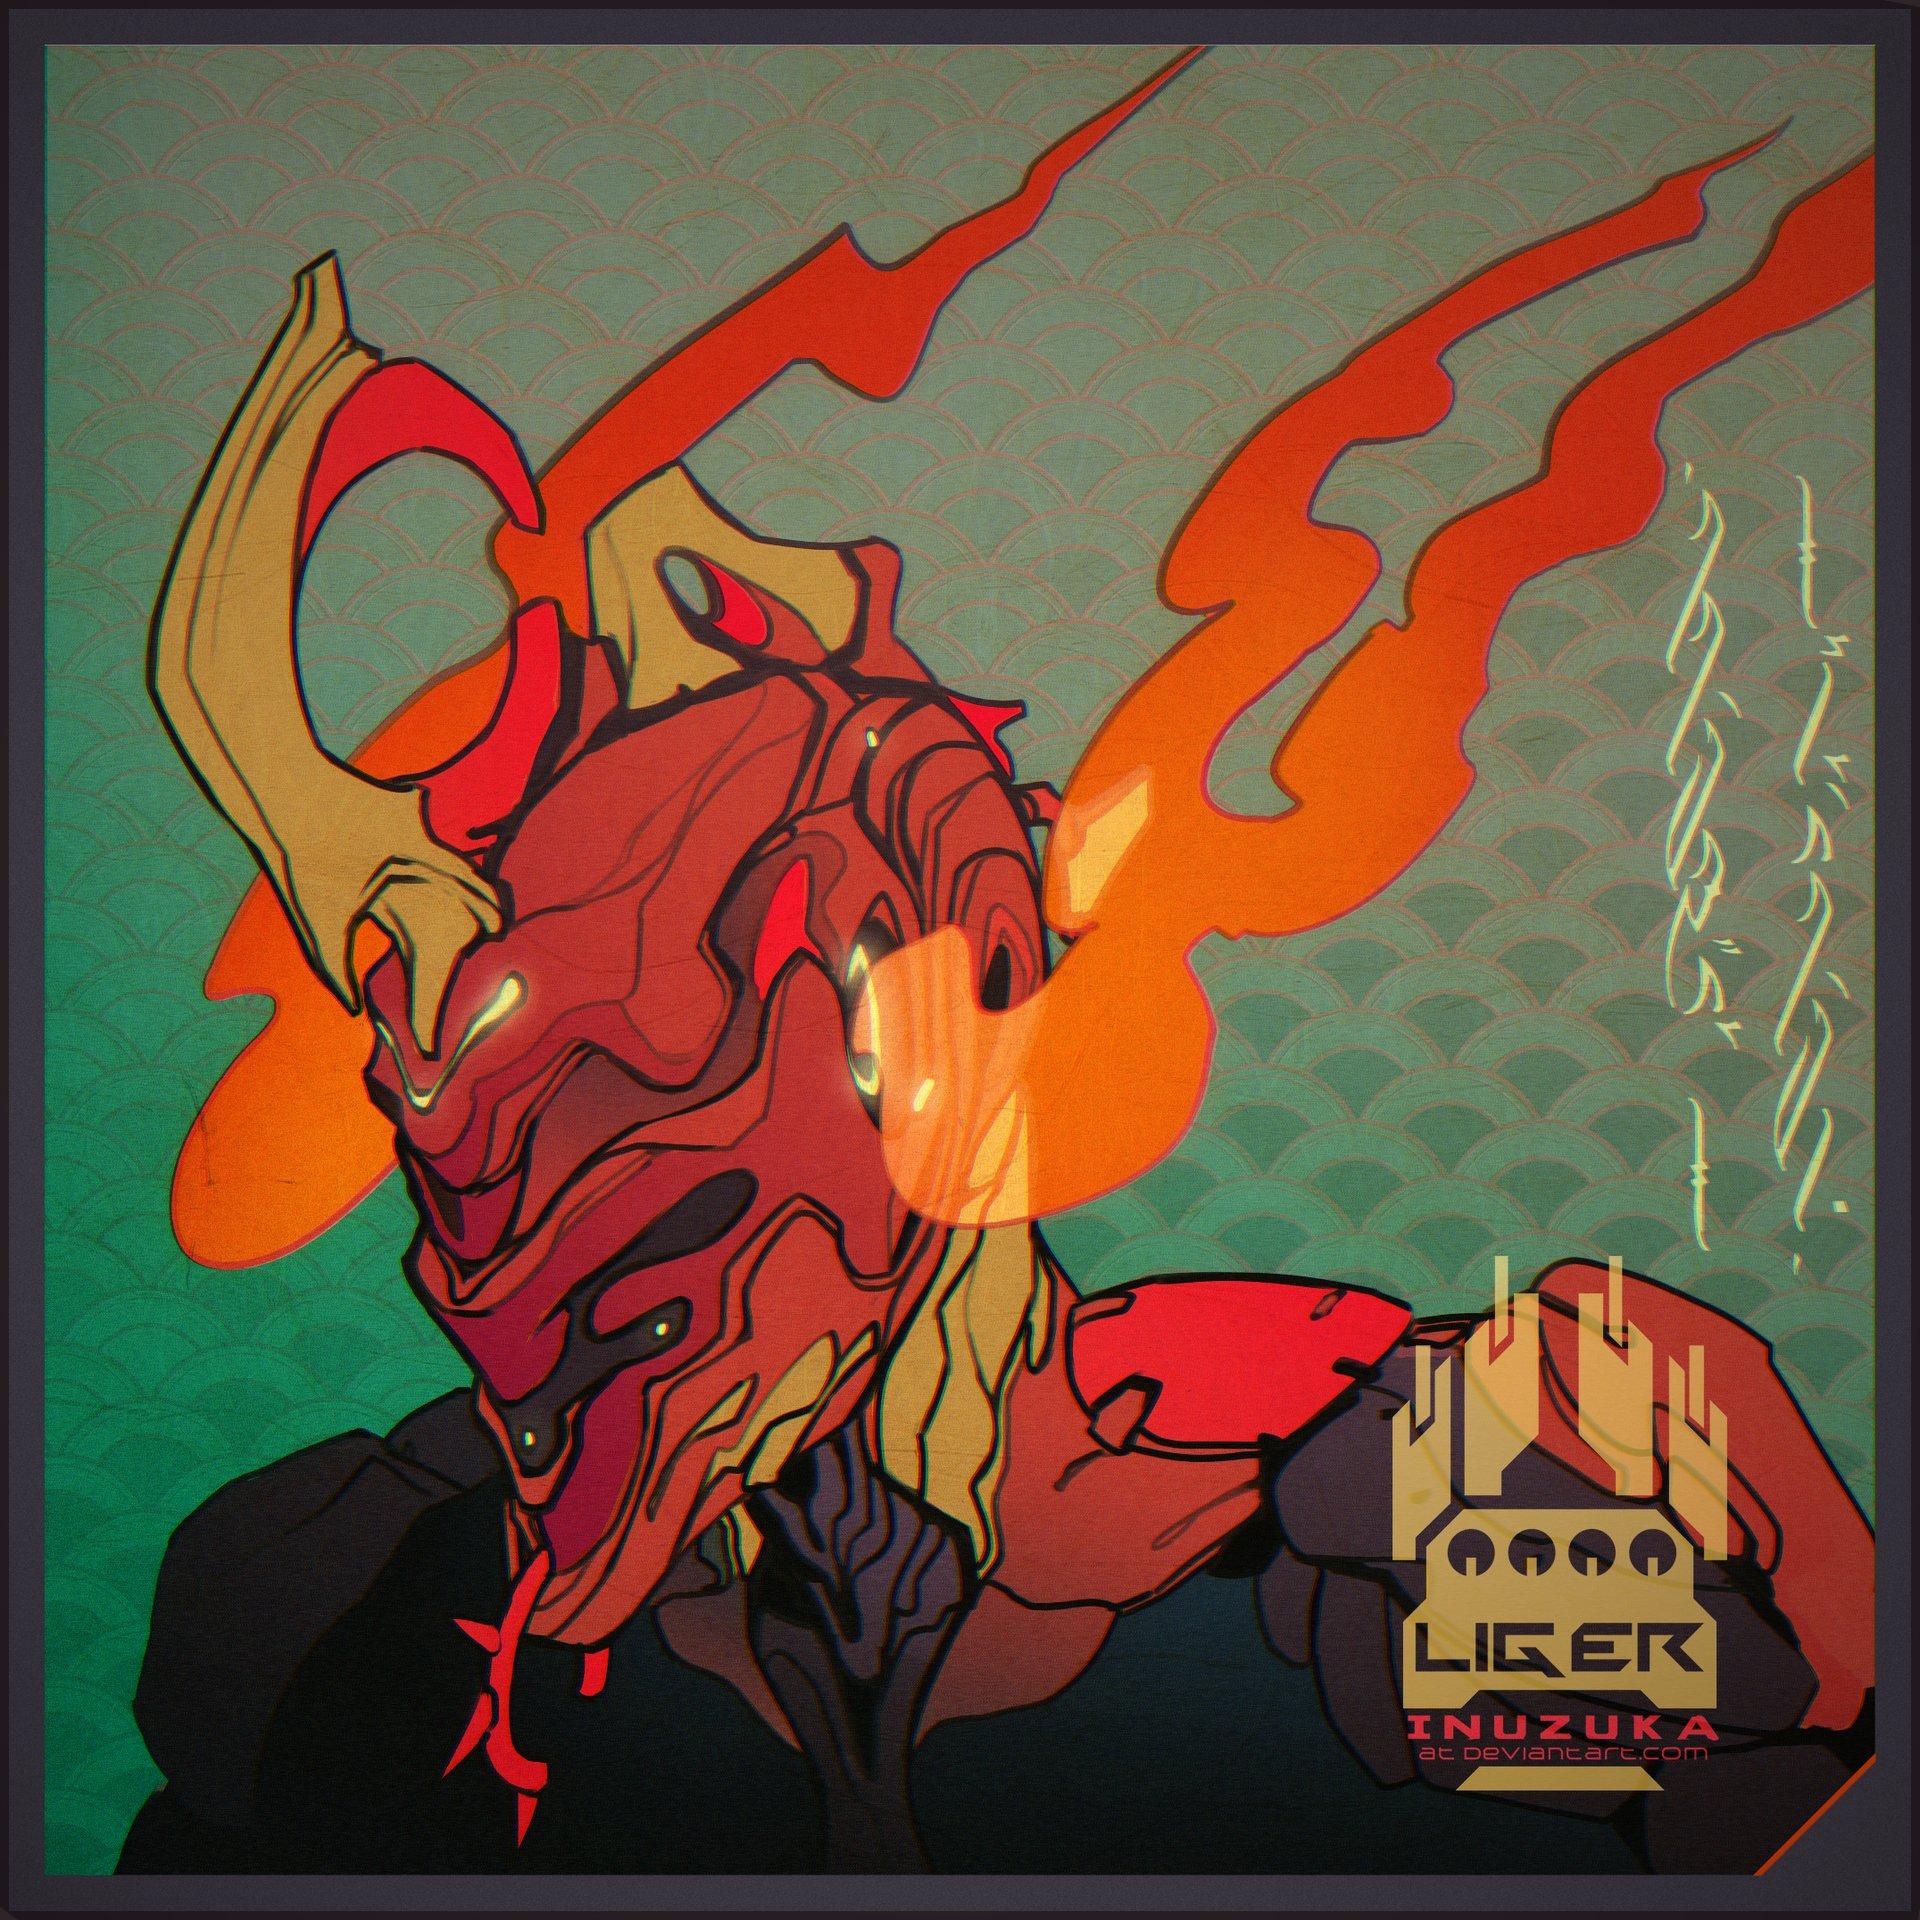 Liger inuzuka ember avatar for sheldon upload